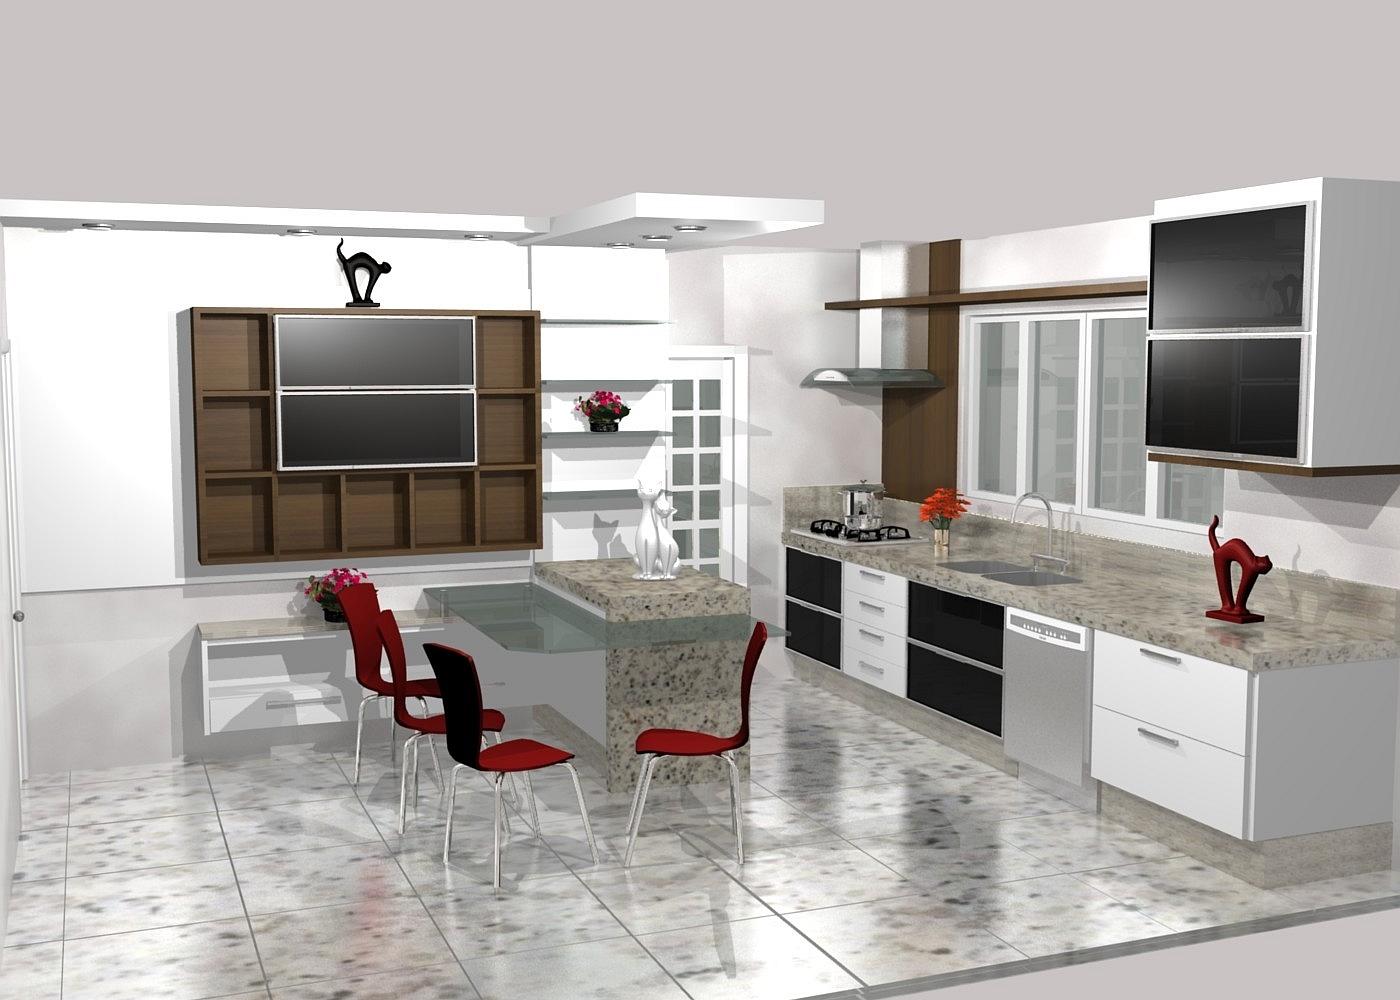 Cozinha Sob Medida Marcenaria Moveis Planejados Furniture Kitchens  #A73124 1400 1000